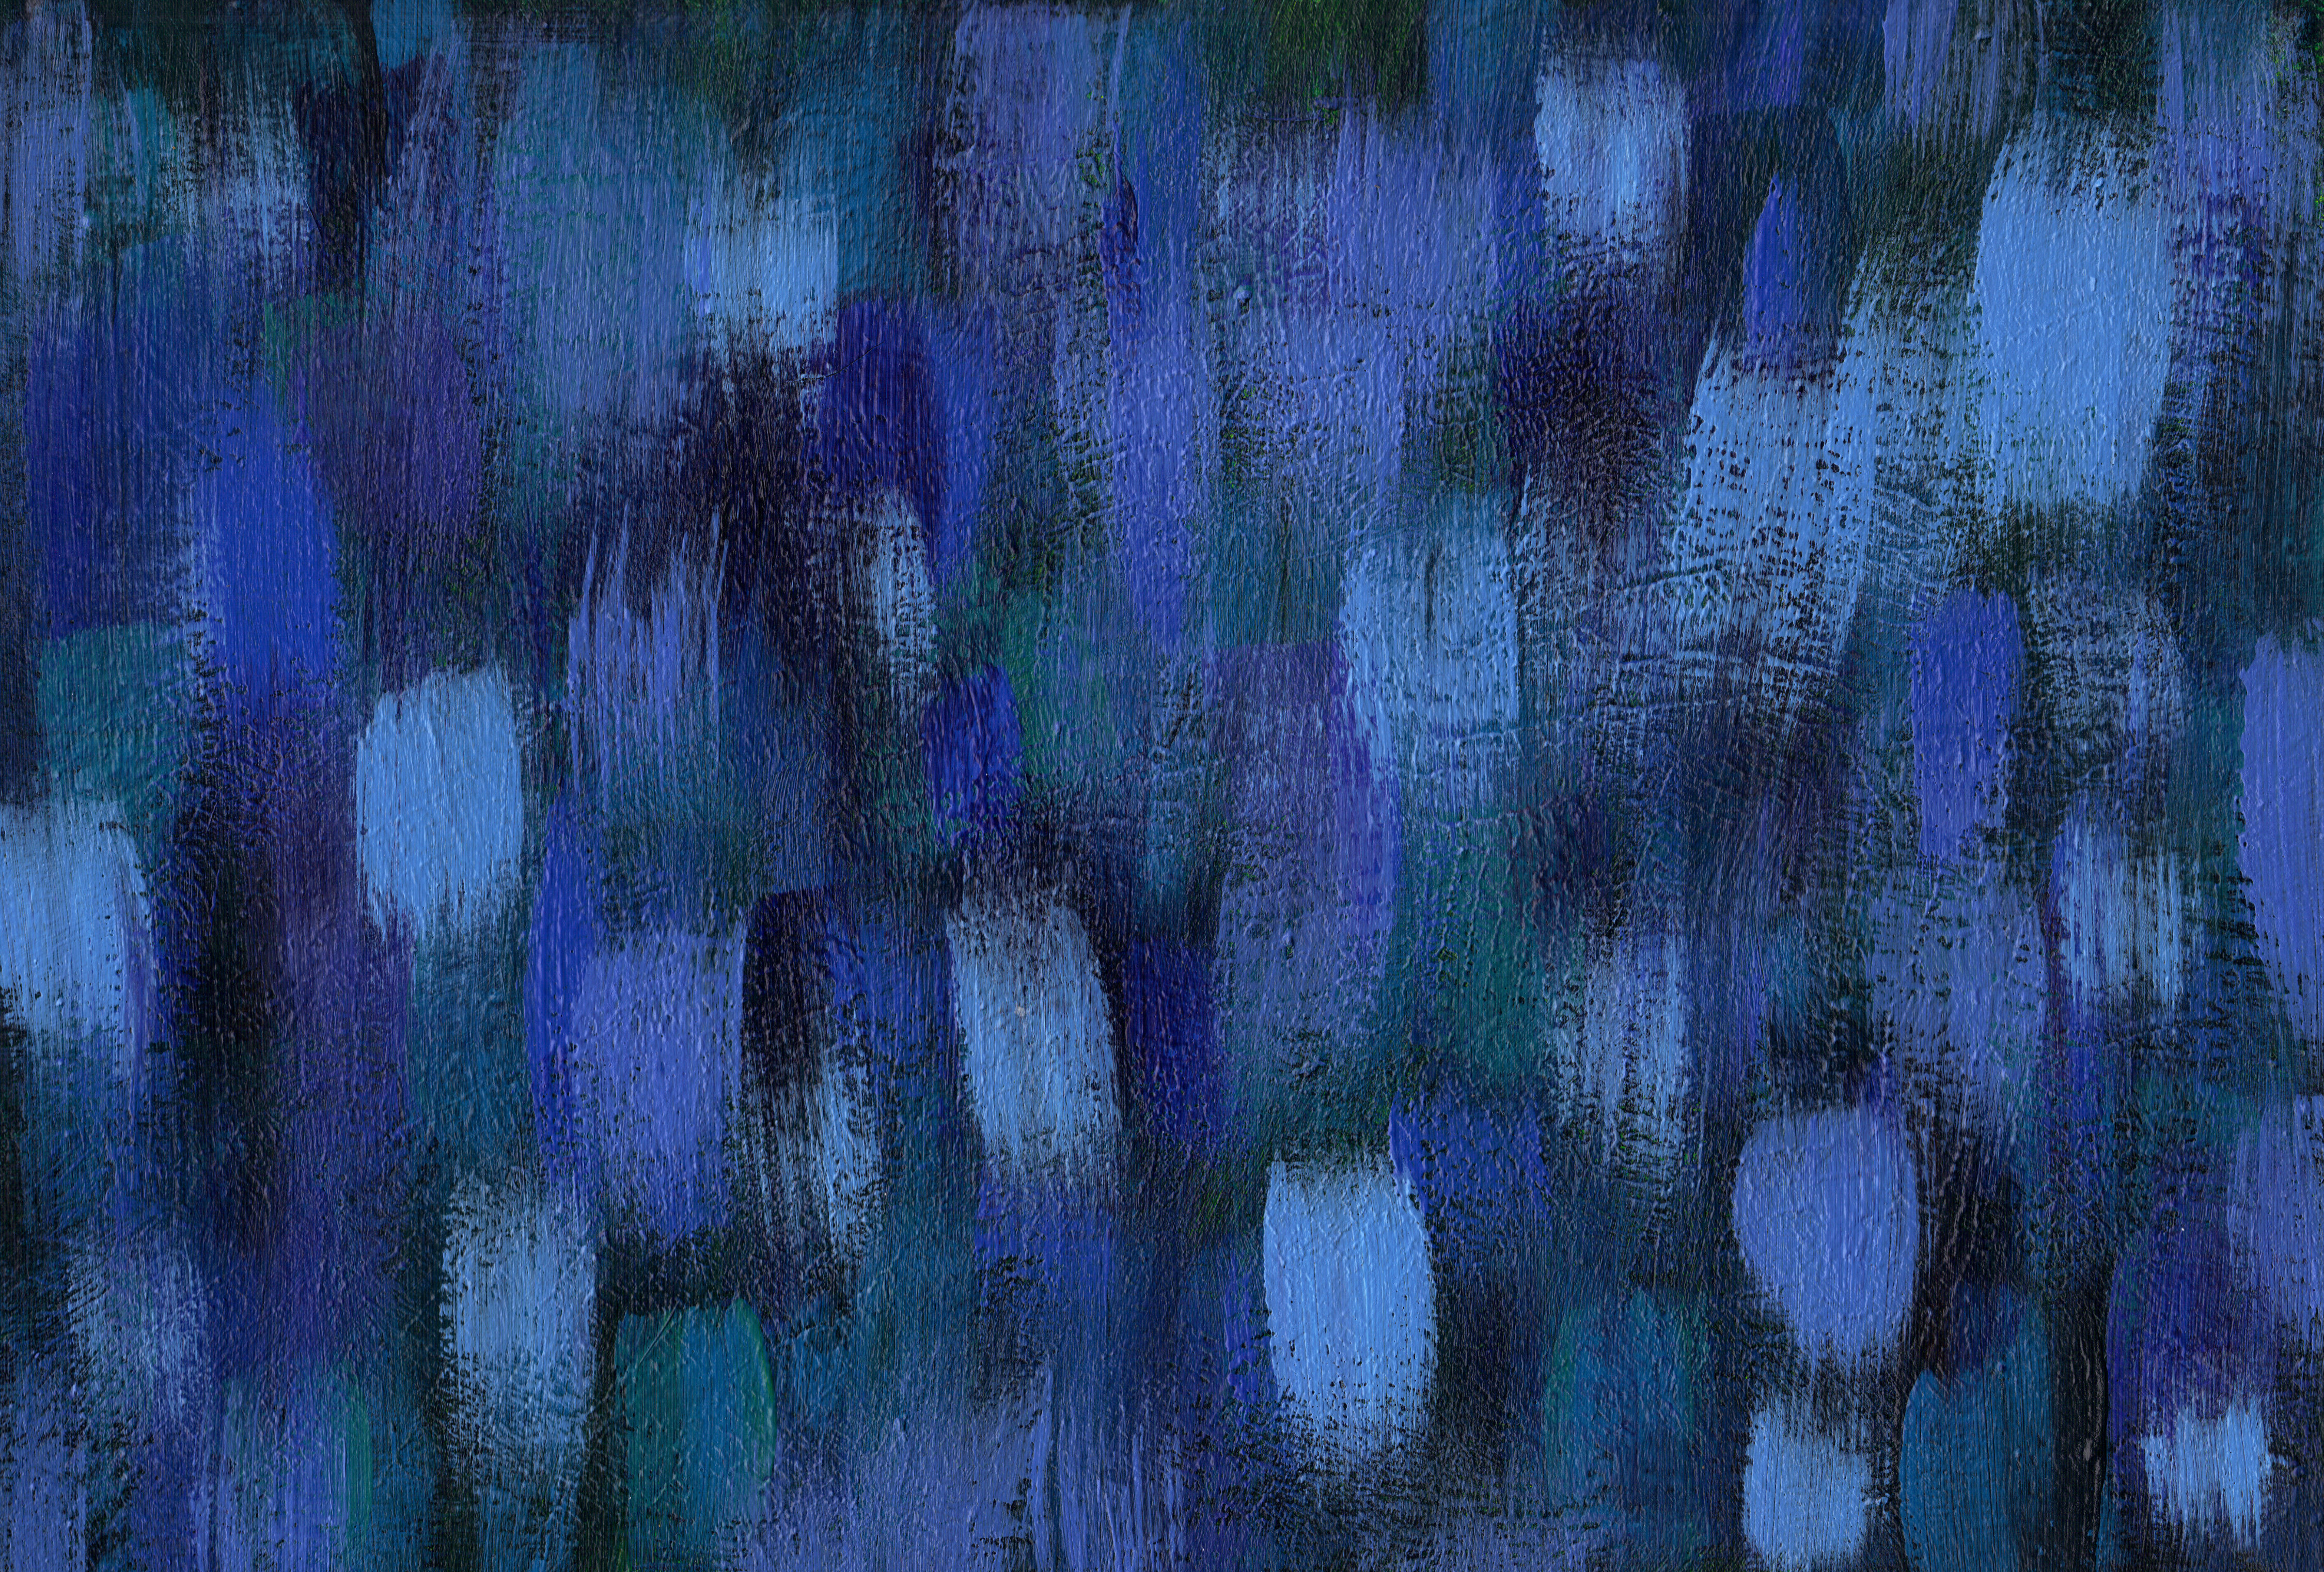 Blue Brush Paint Texture (JPG) | OnlyGFX.com